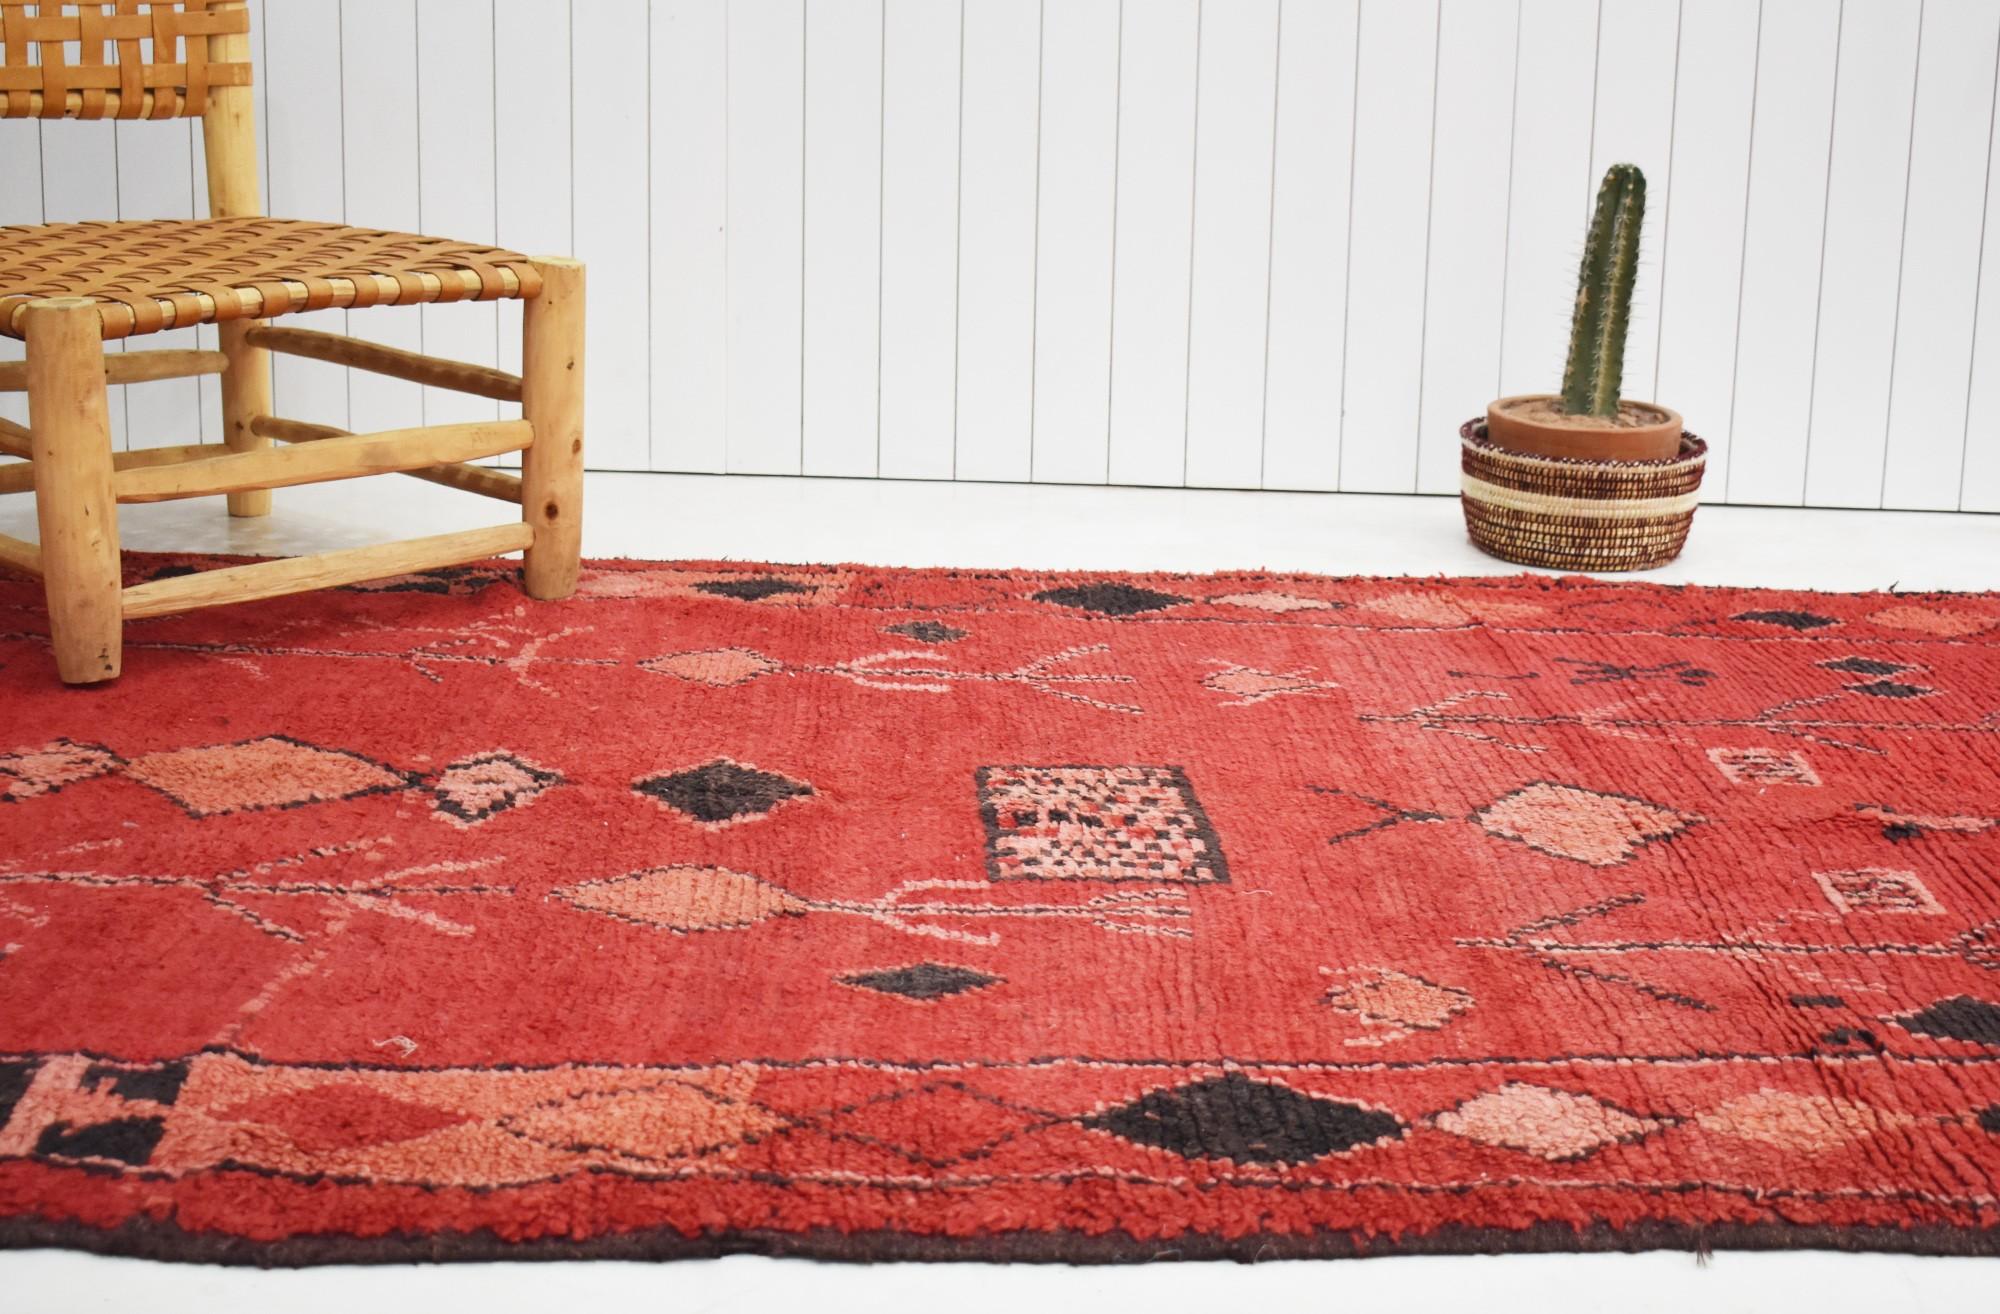 Petit tapis berbère vintage Orange Rouge